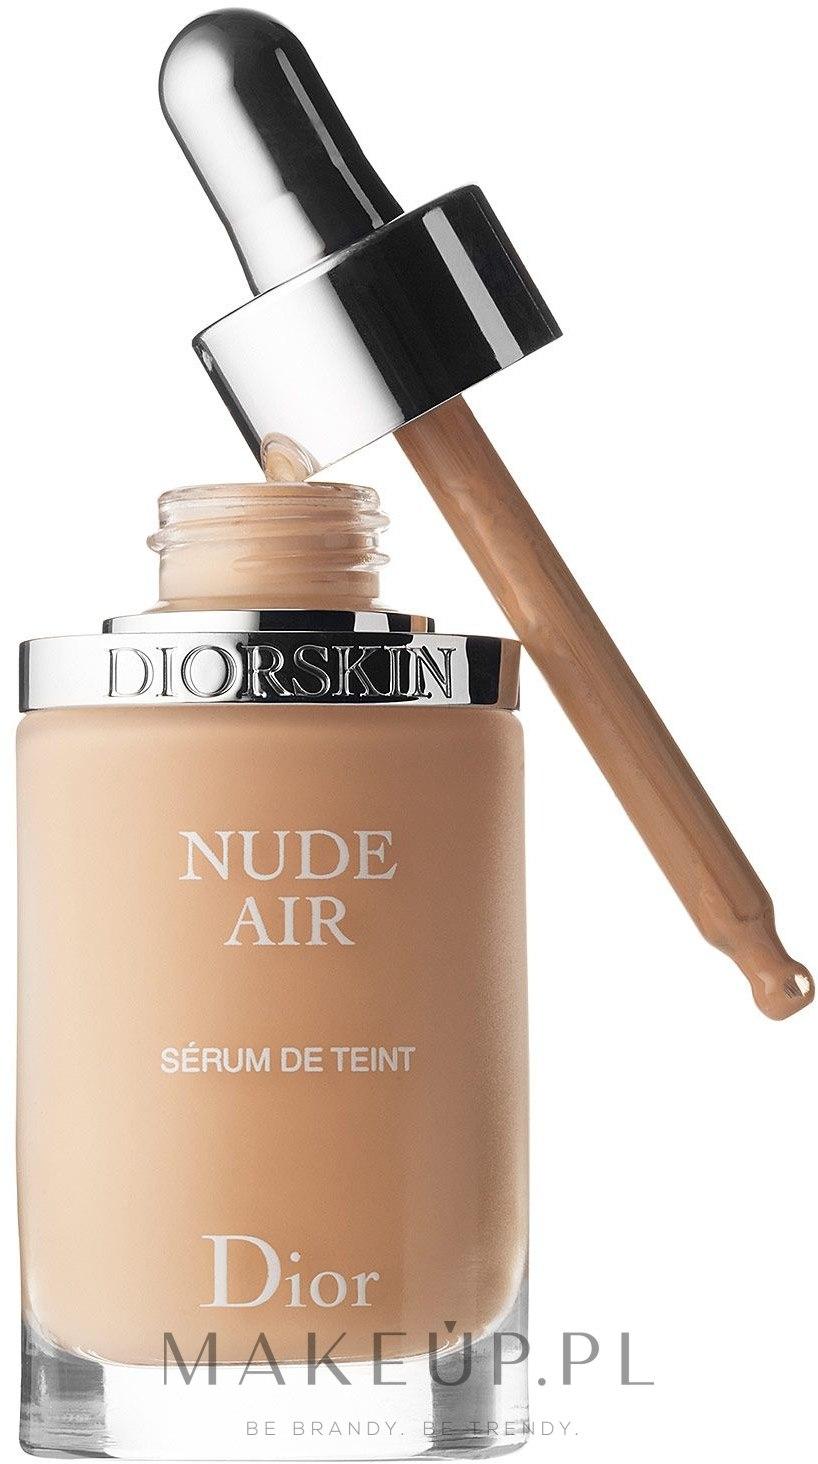 Christian Dior, Diorskin, Nude Air, Luminizer Serum